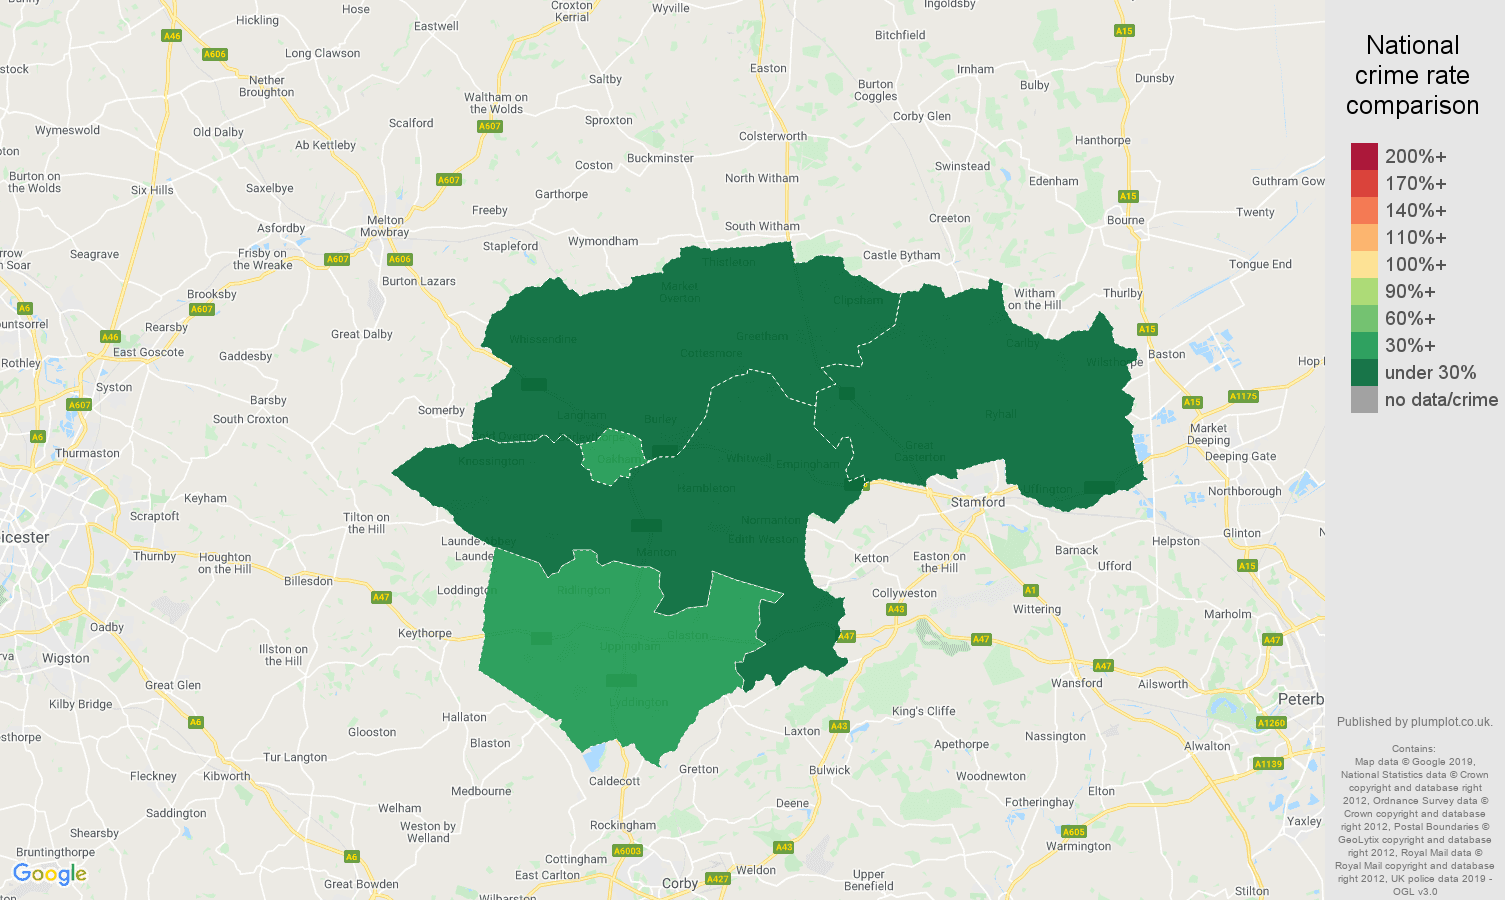 Rutland public order crime rate comparison map